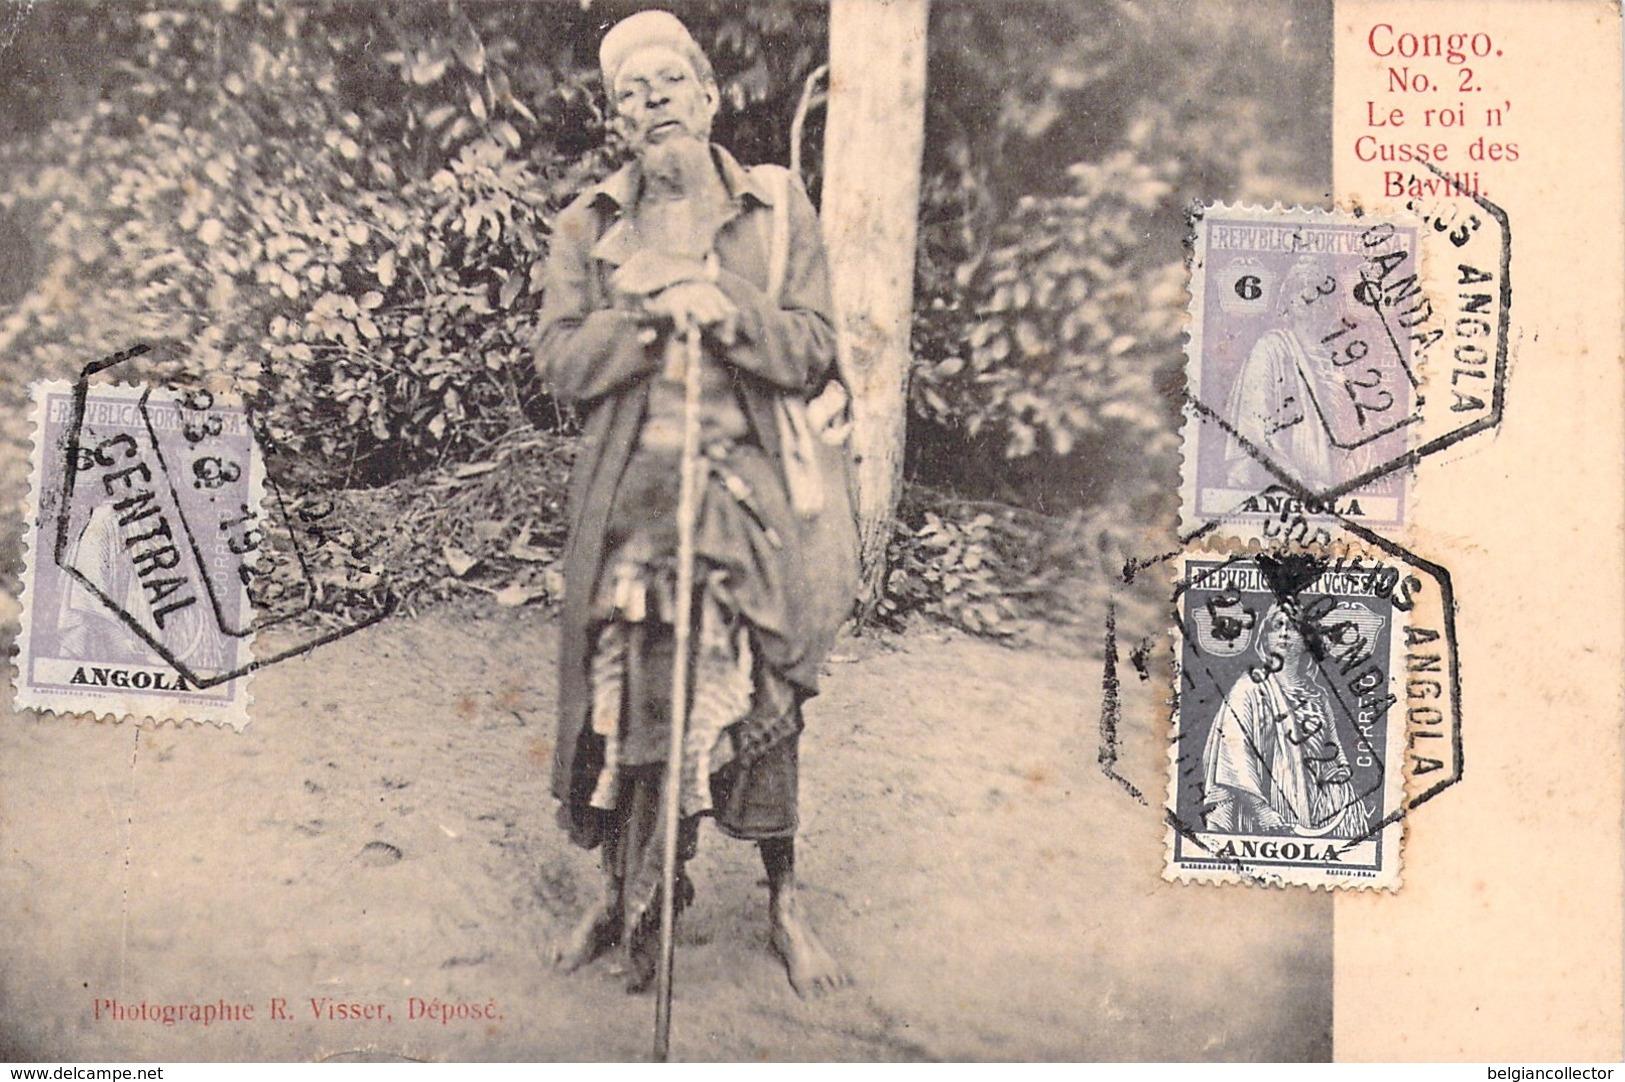 1922 - Angola - Congo - Le Roi N'Cusse Des Bavilli - Loanda - Visser - Angola